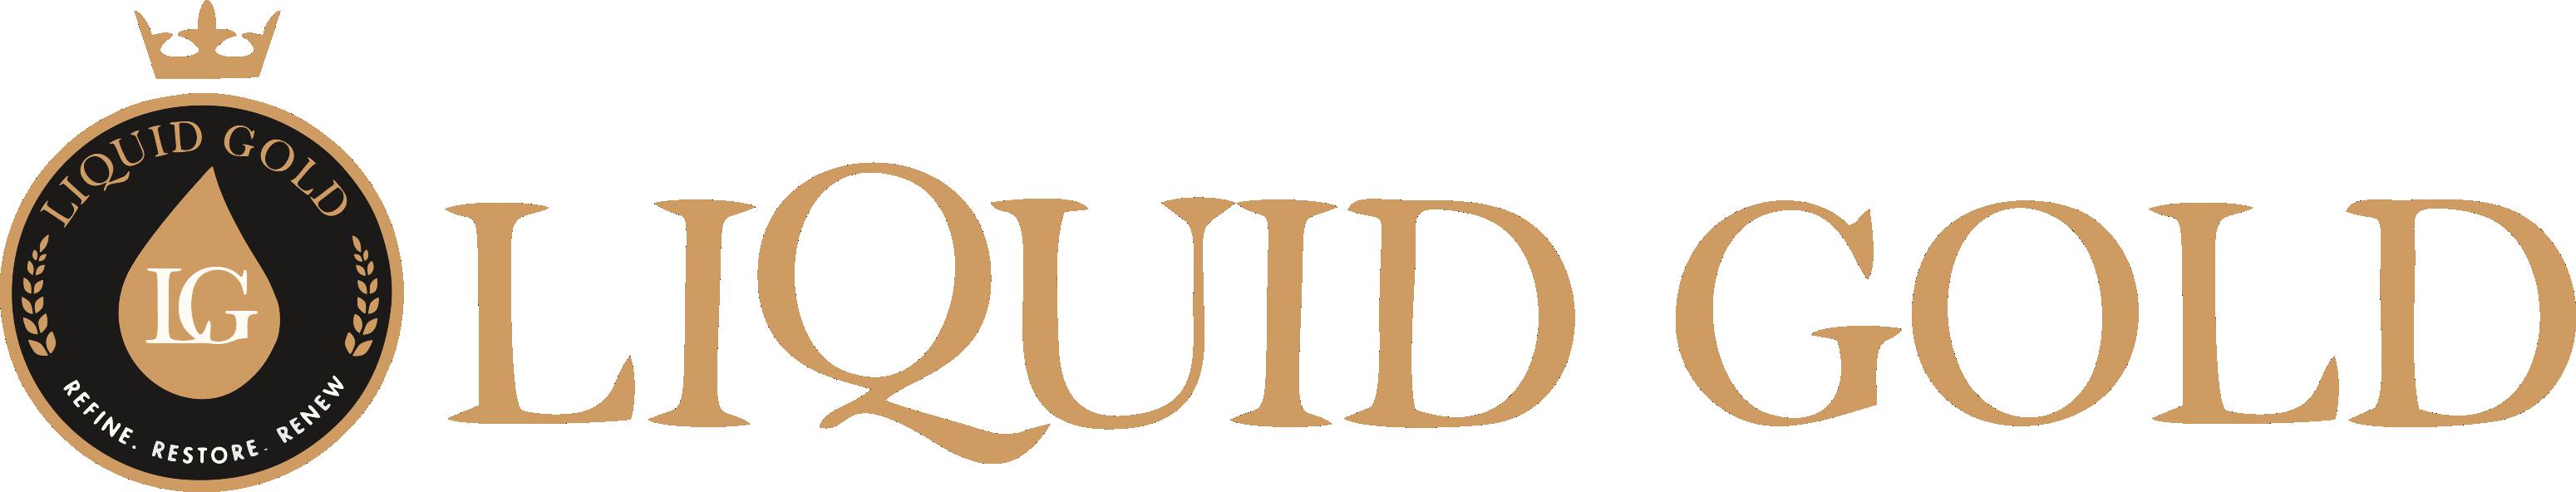 Liquid gold website set up